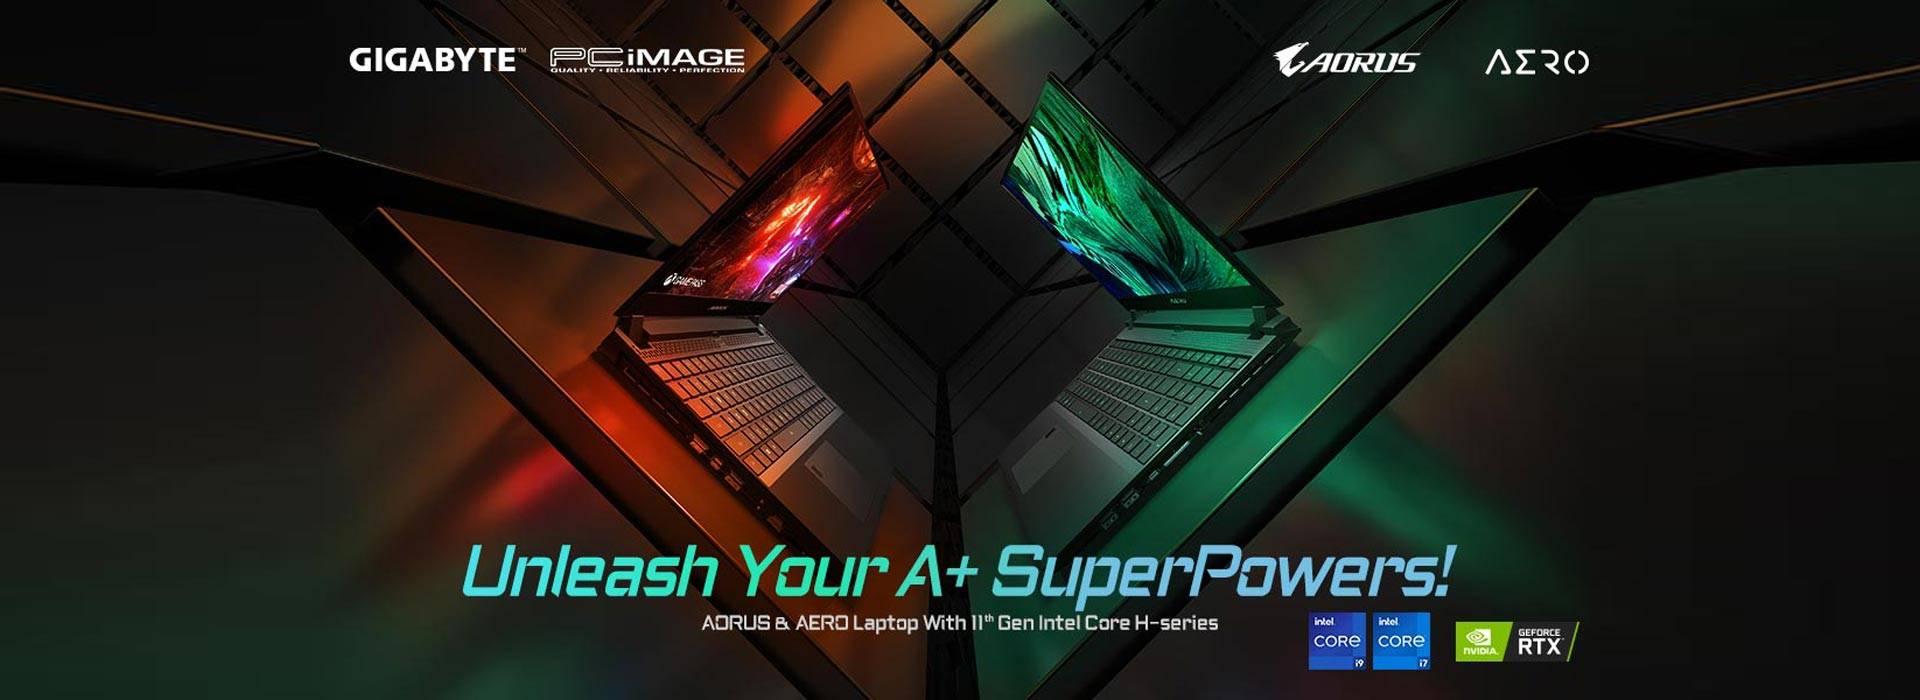 PRE-ORDER AERO & AORUS 11 GEN gaming laptops